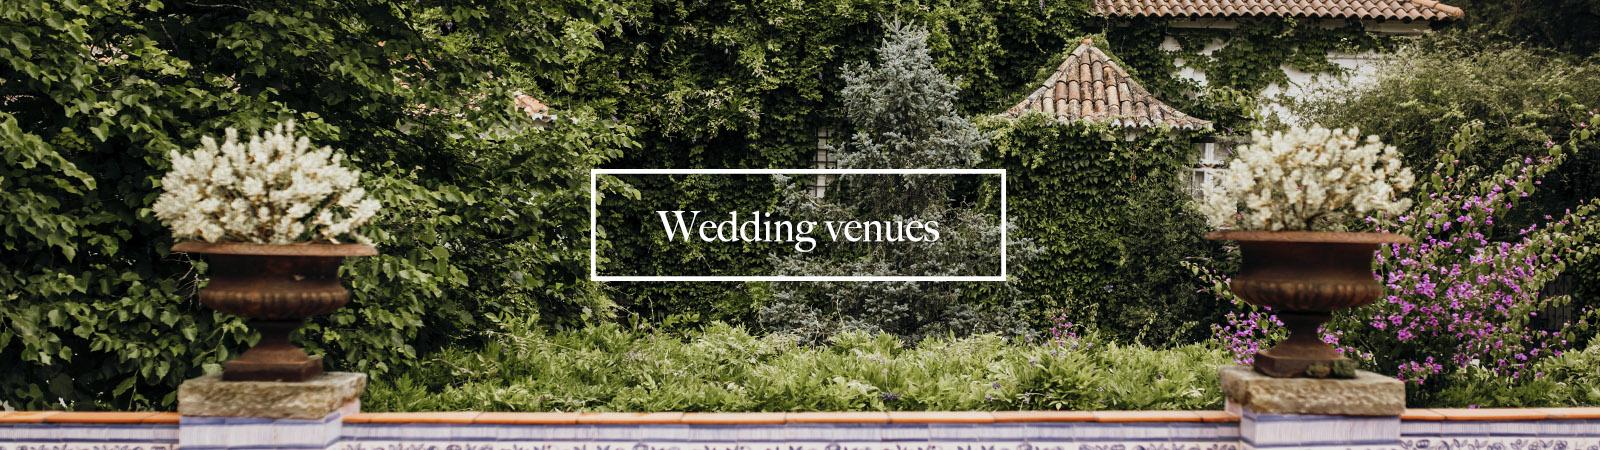 lisbon wedding venues